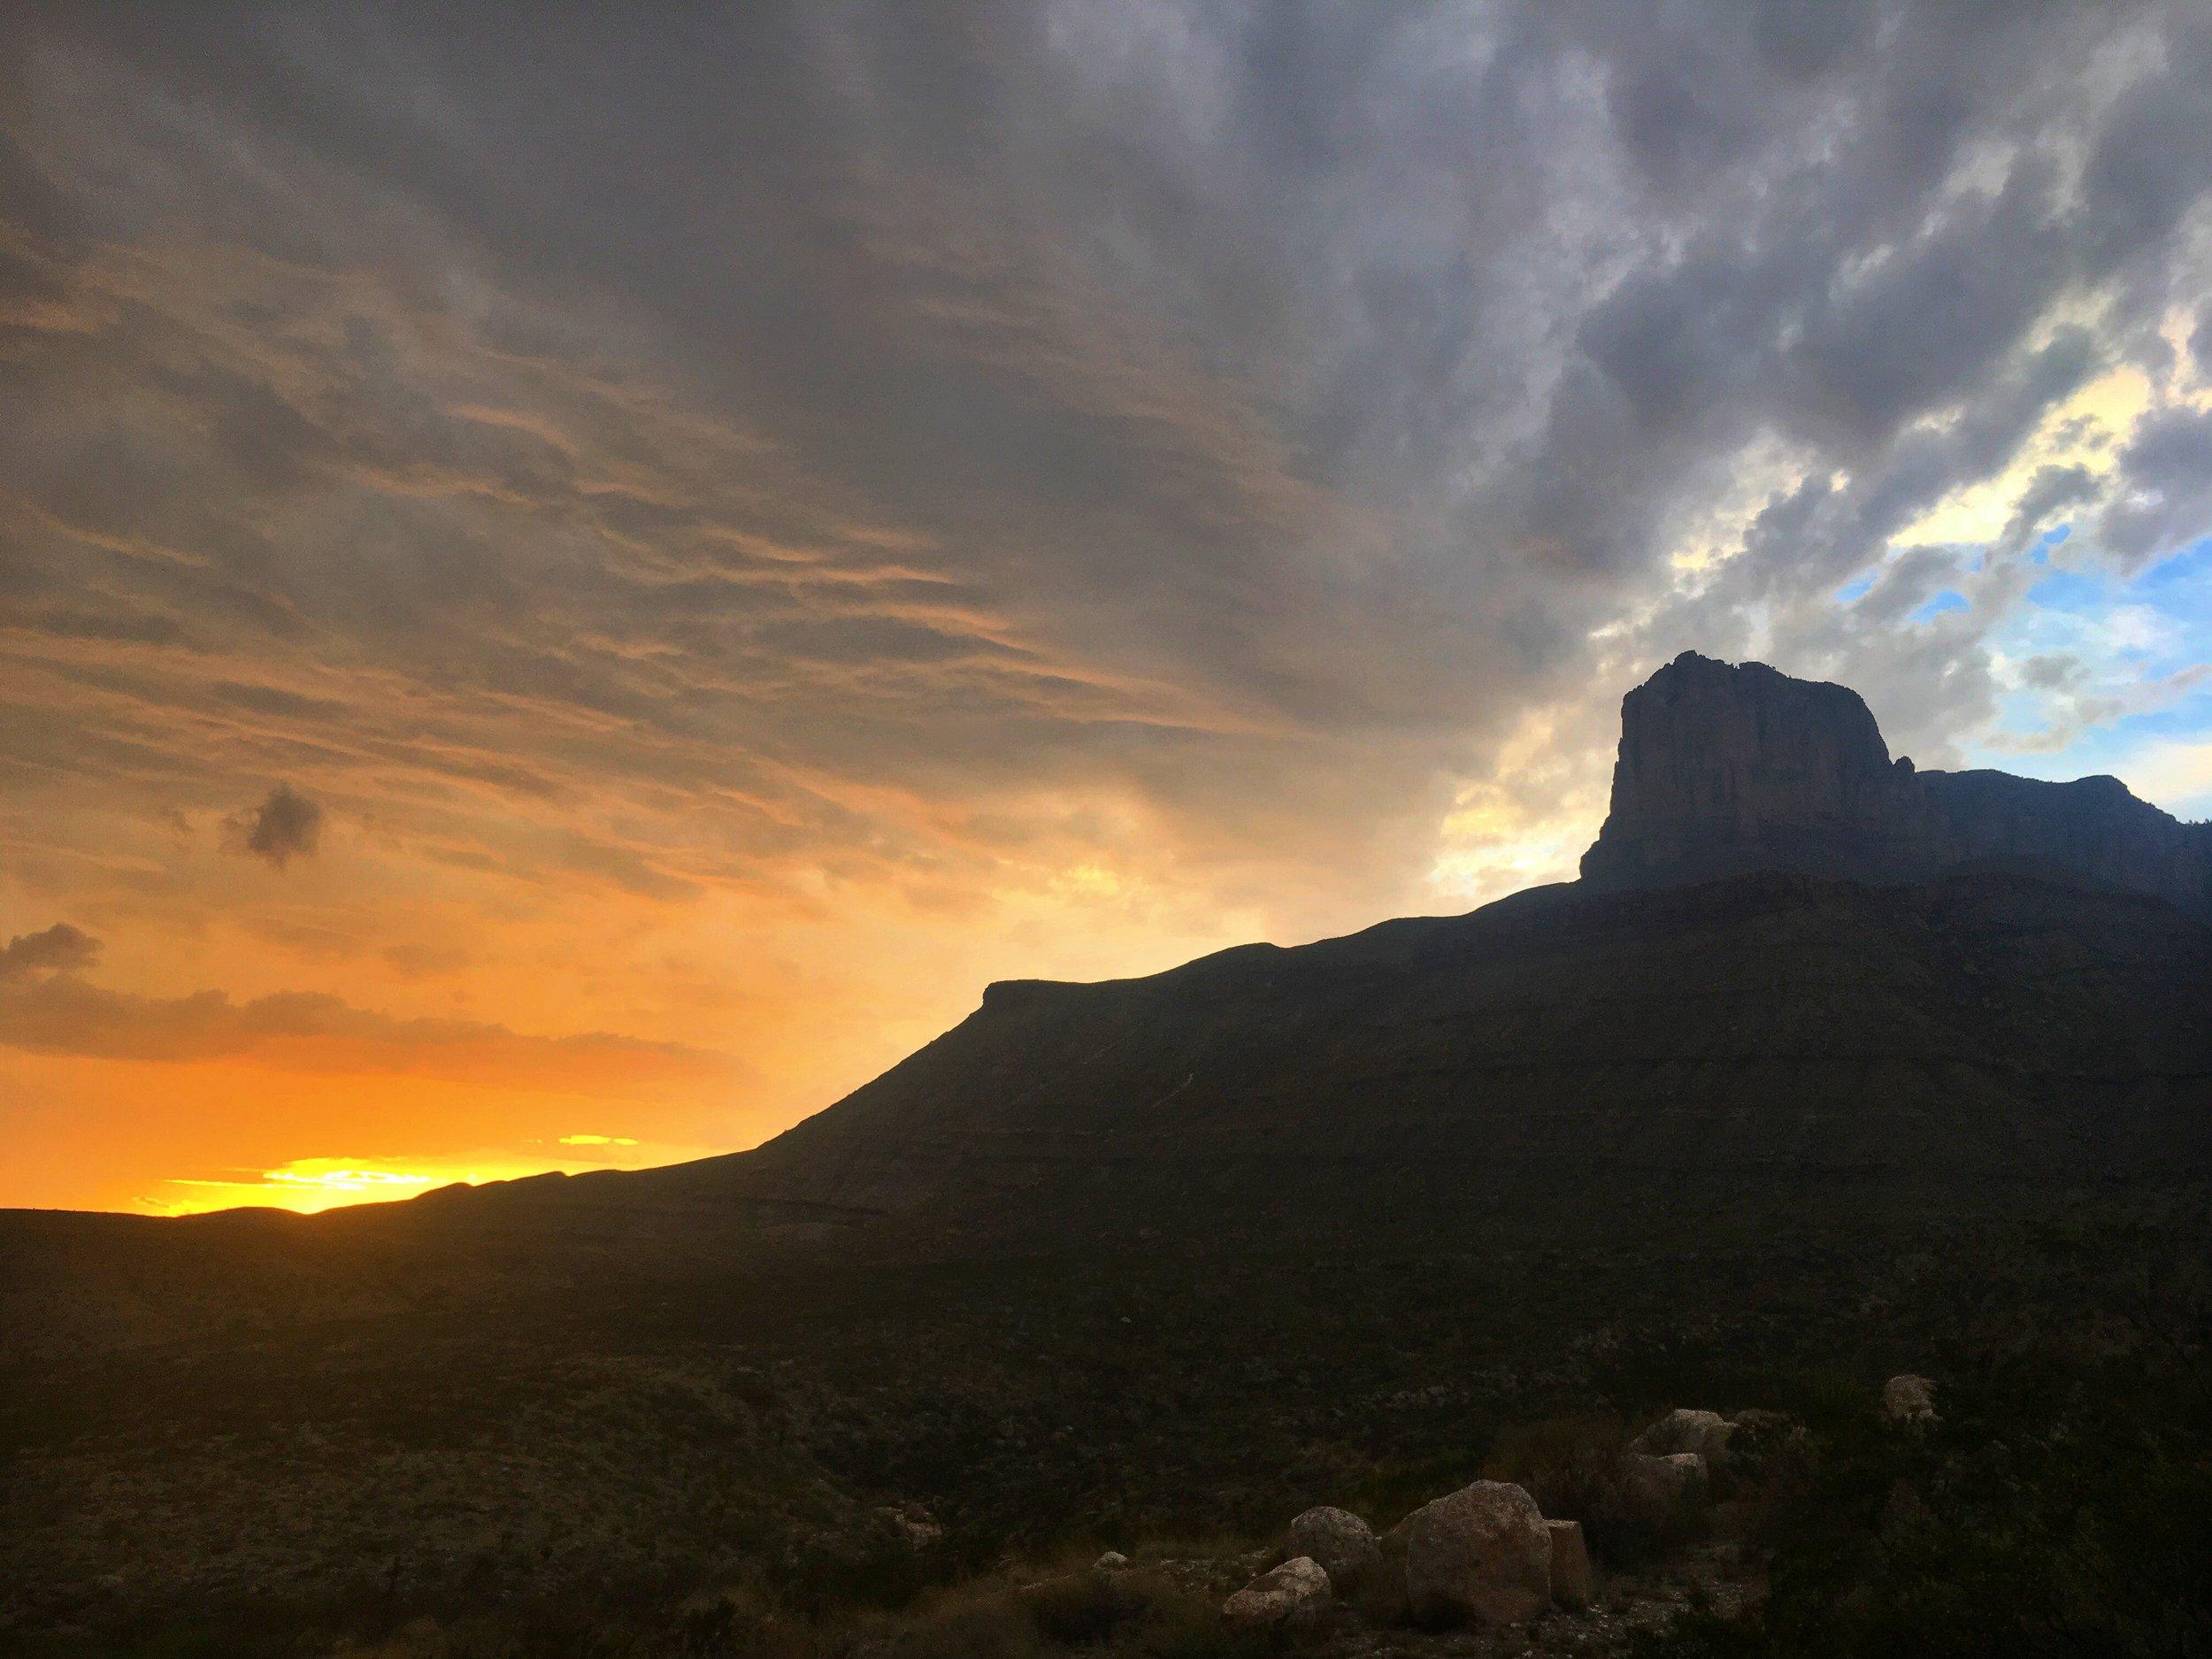 Sunset behind El Capitan